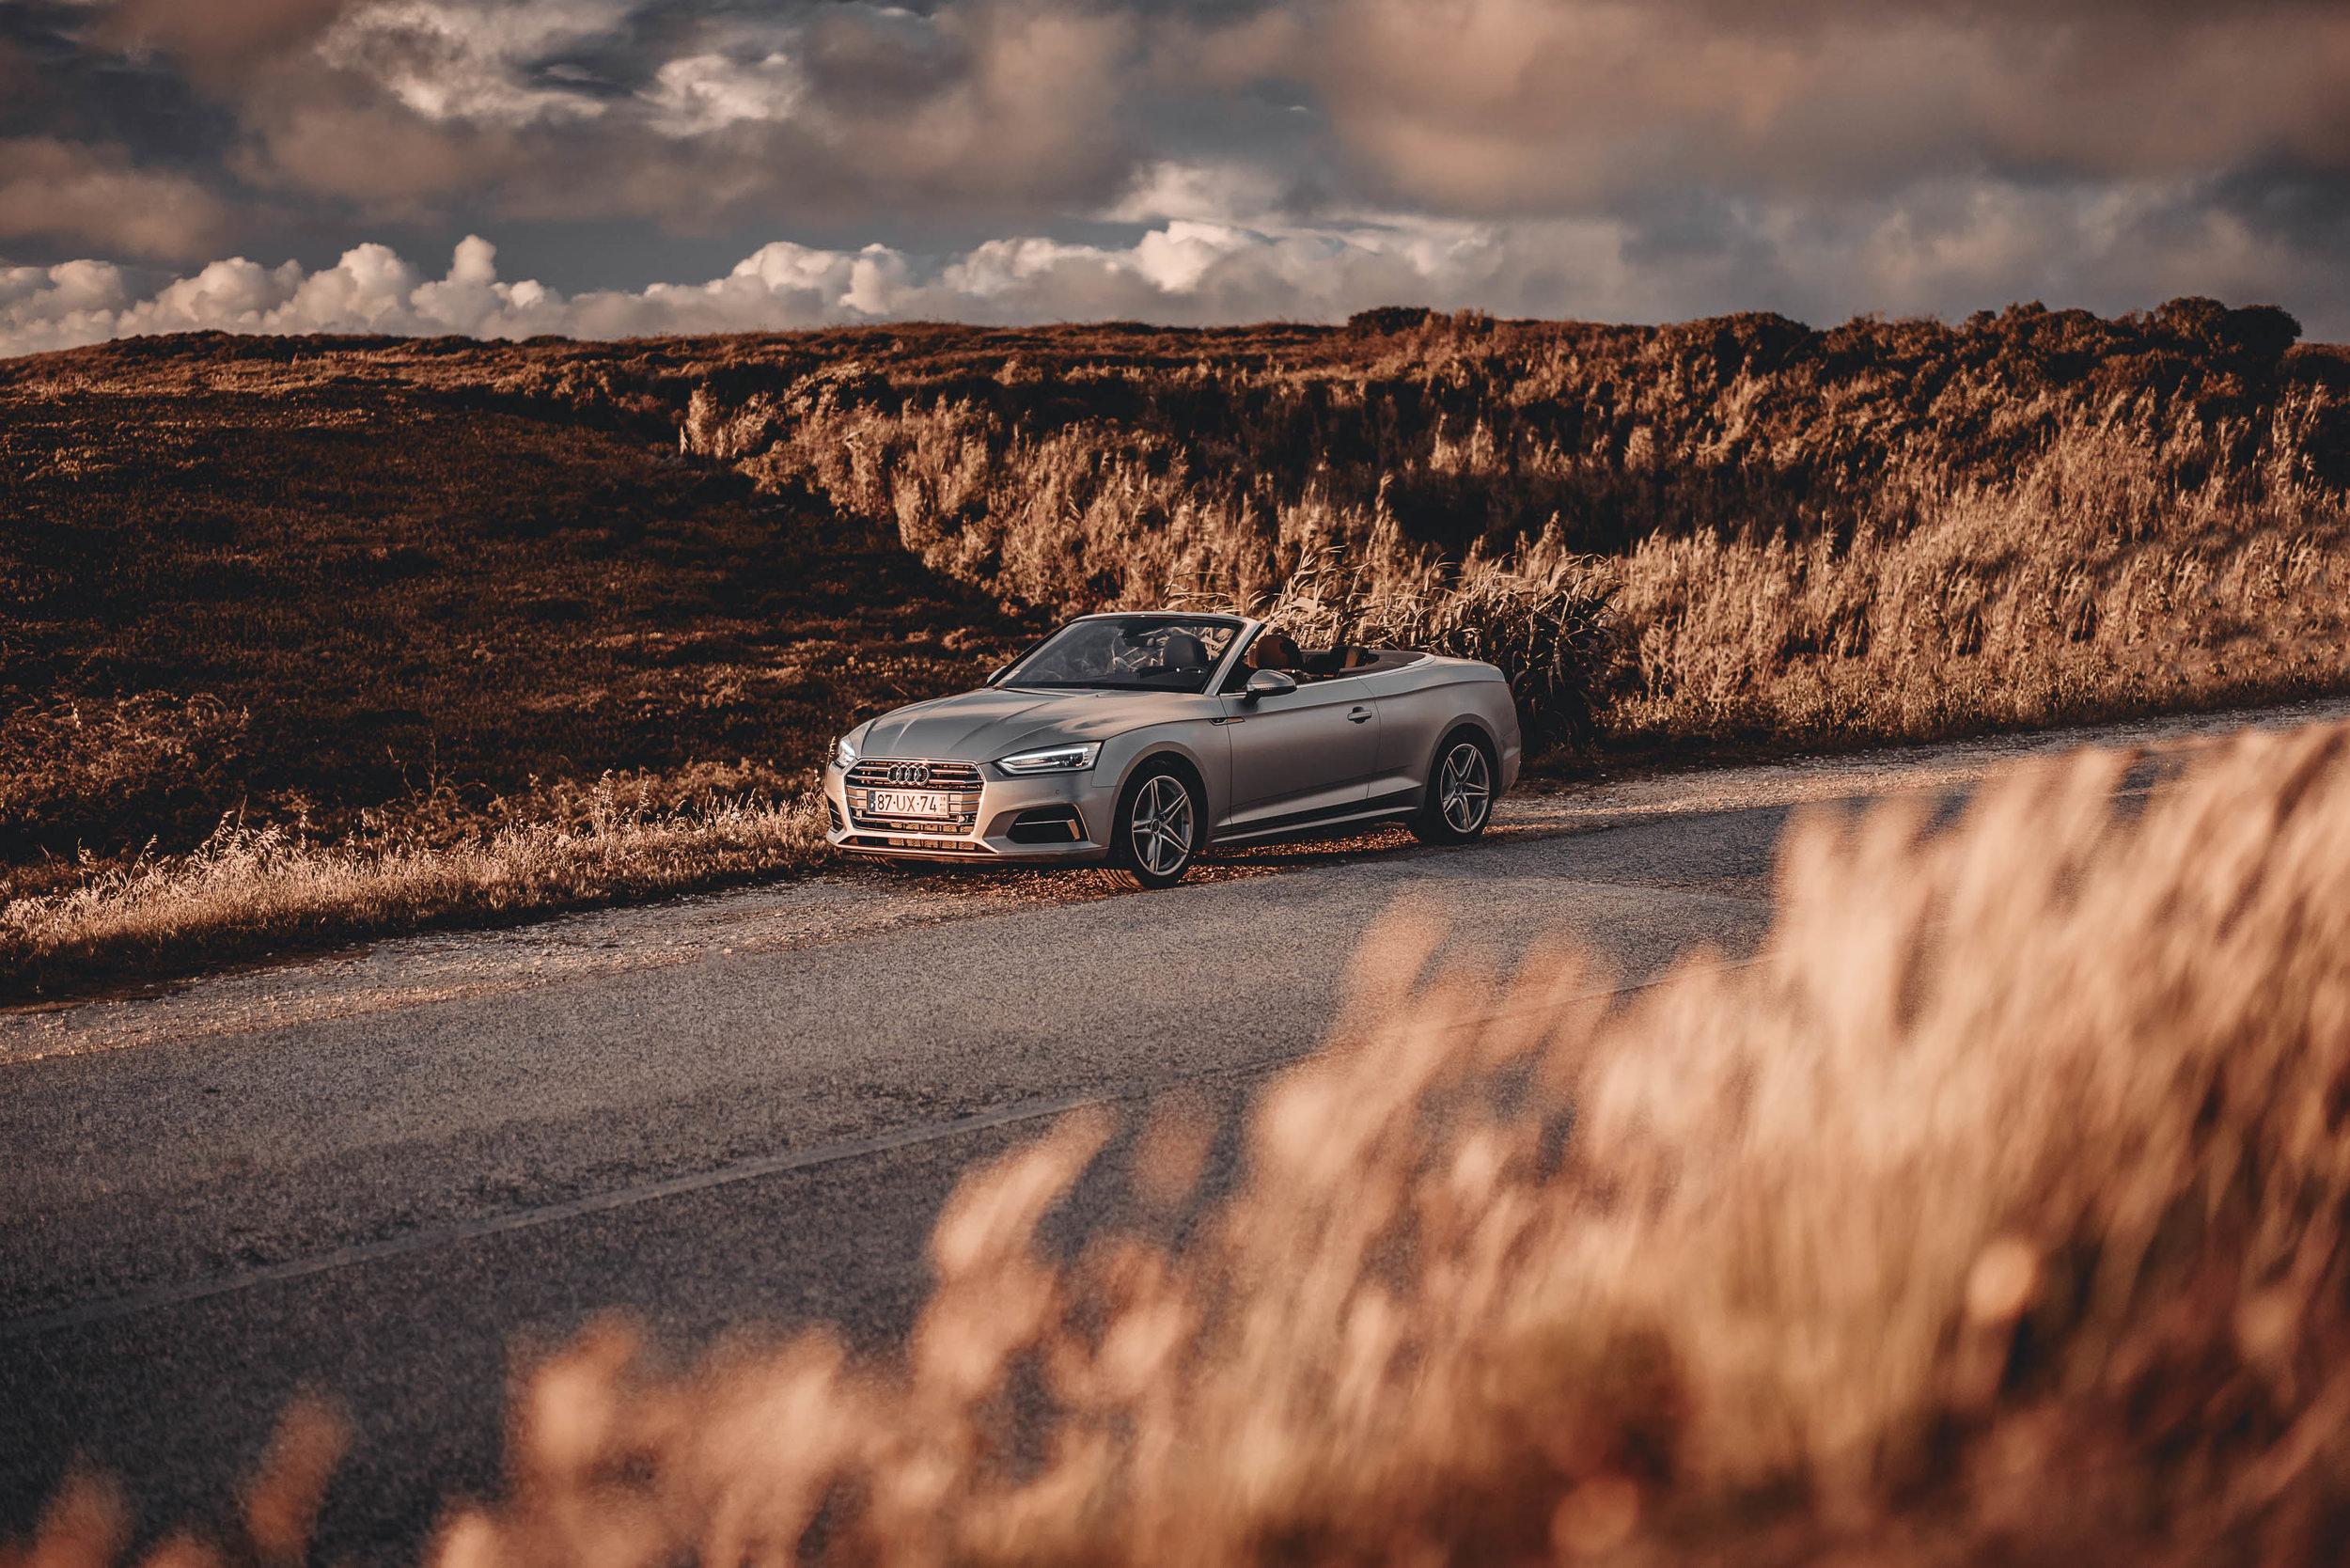 Maximilian_Otto_Audi_A5_Cabriolet_Portugal_01_WEB.jpg